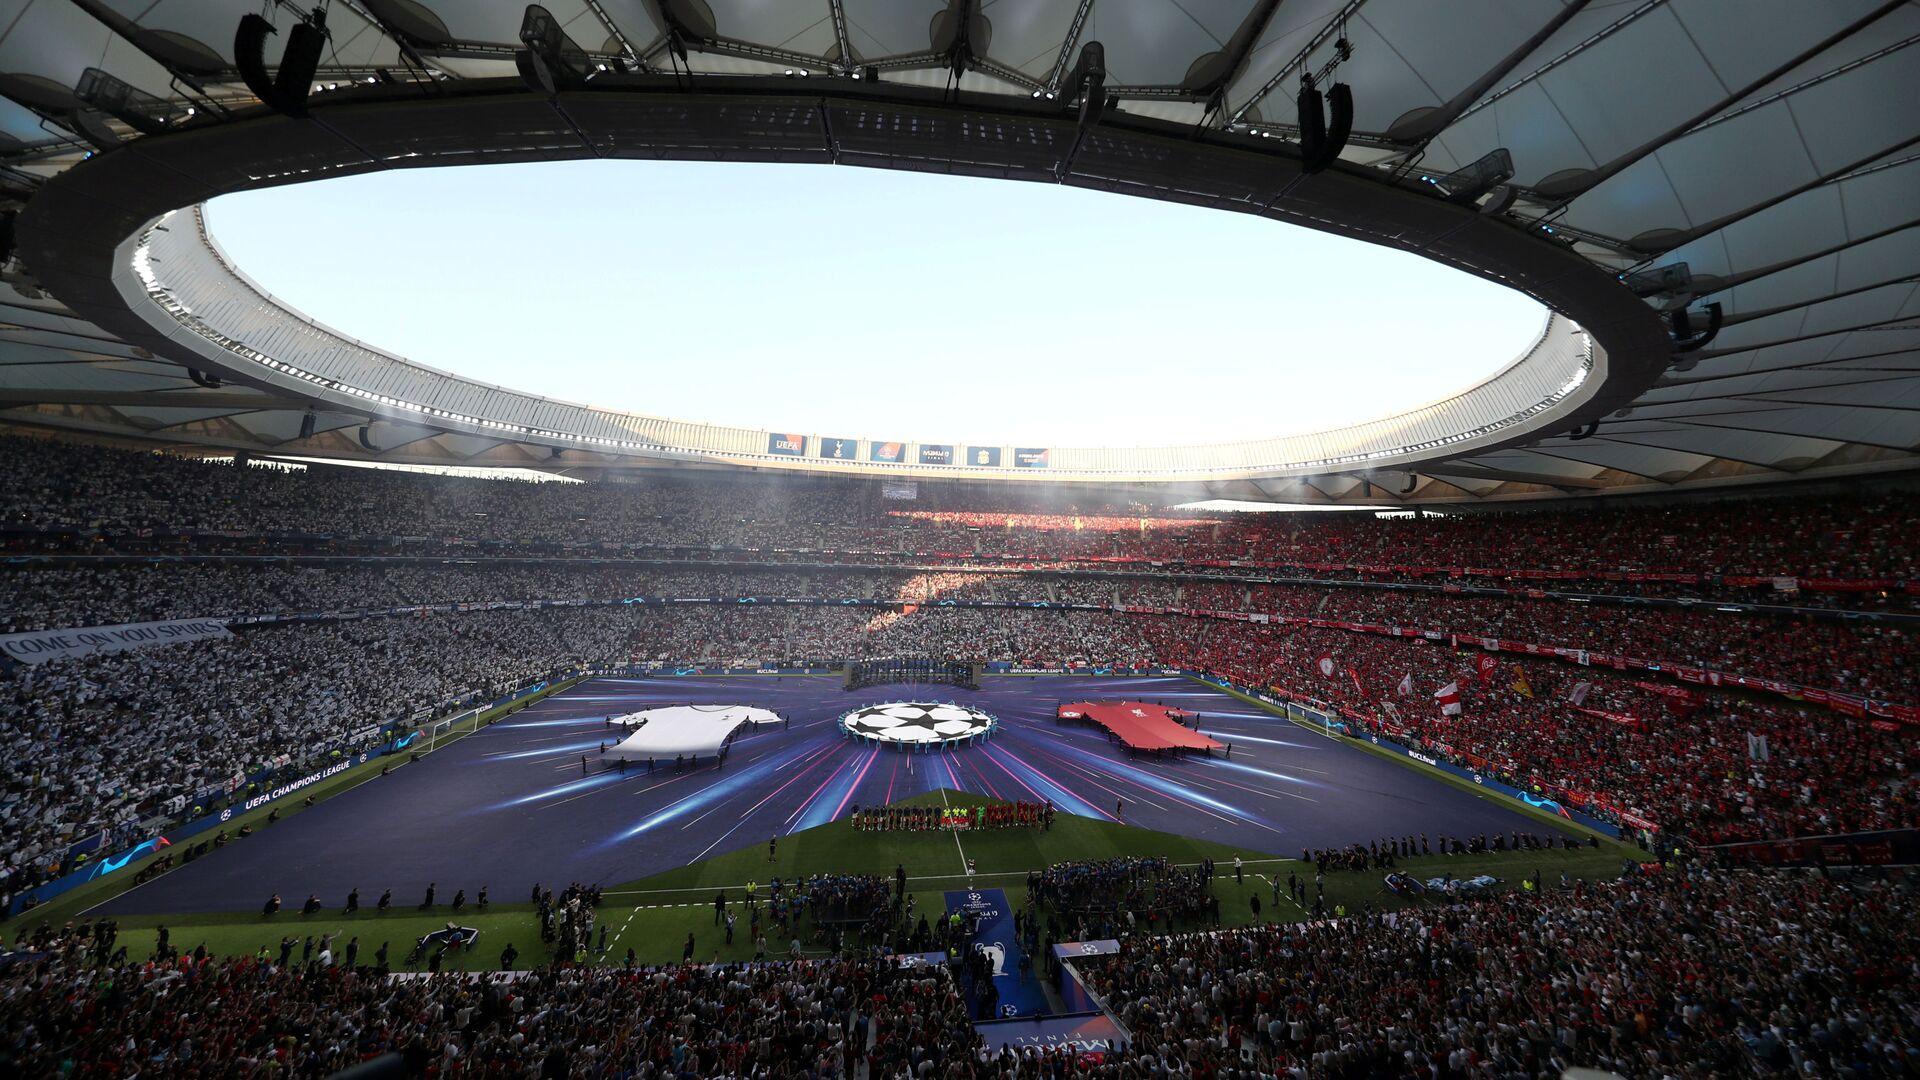 Champions League, Tottenham Hotspur contro Liverpool, Madrid, giugno 1 - Sputnik Italia, 1920, 19.05.2021